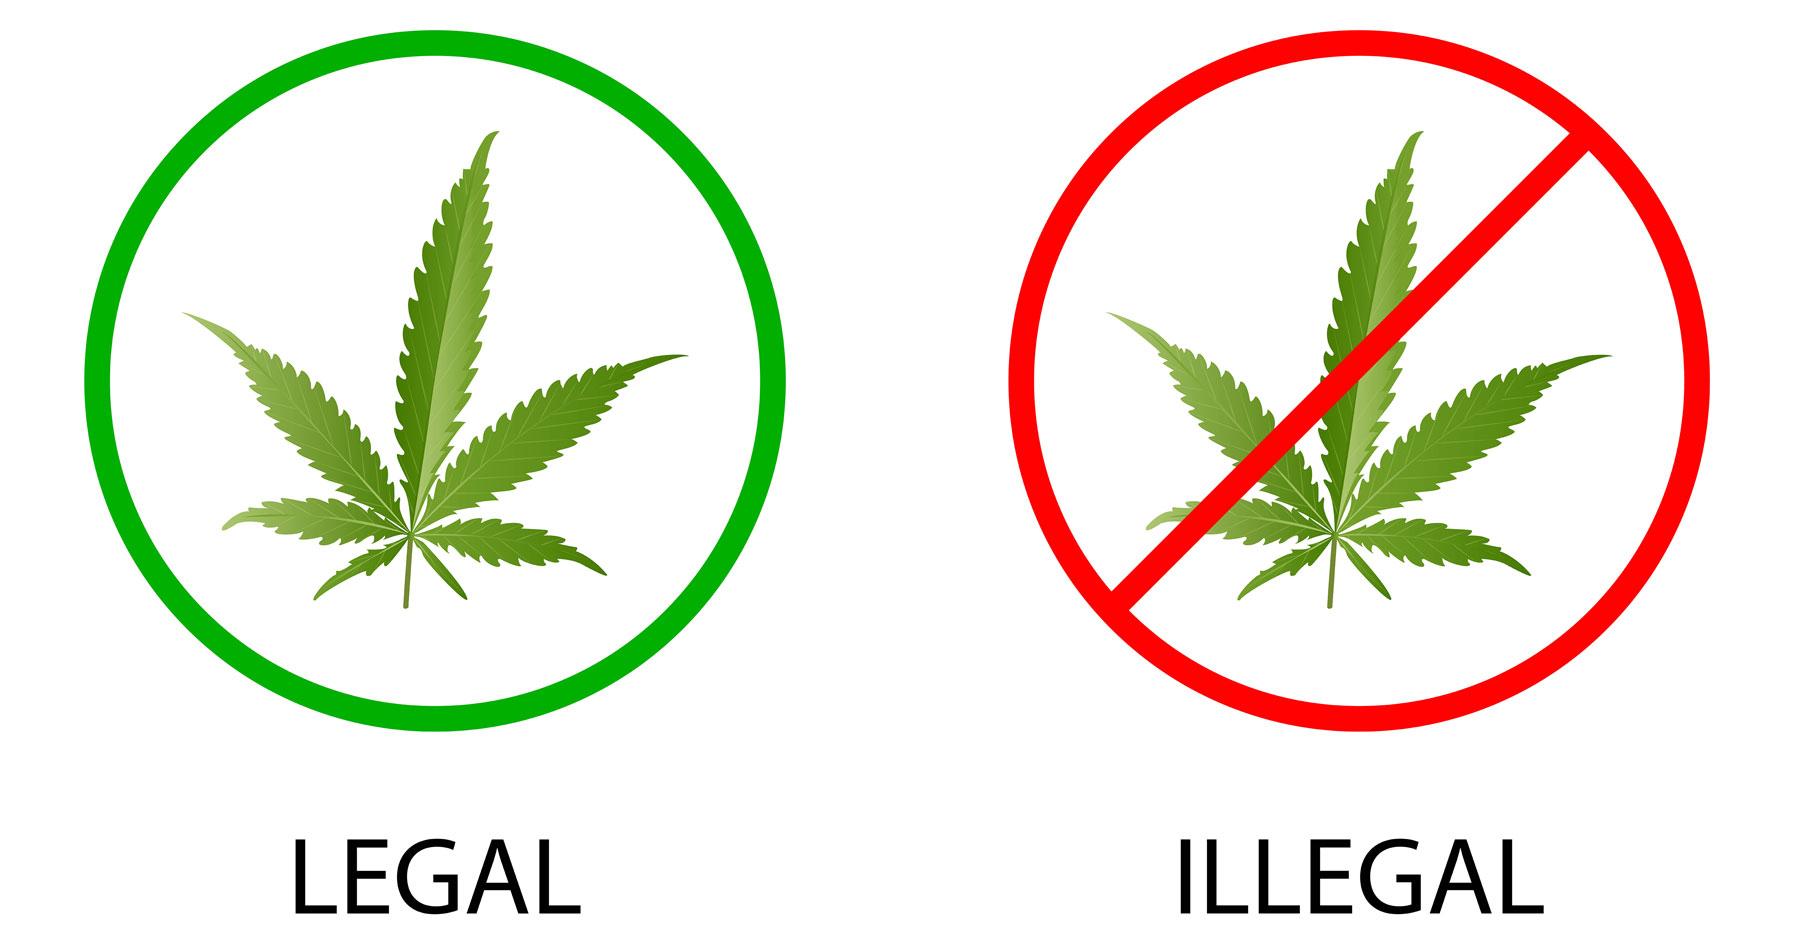 legal v illegal marijuana